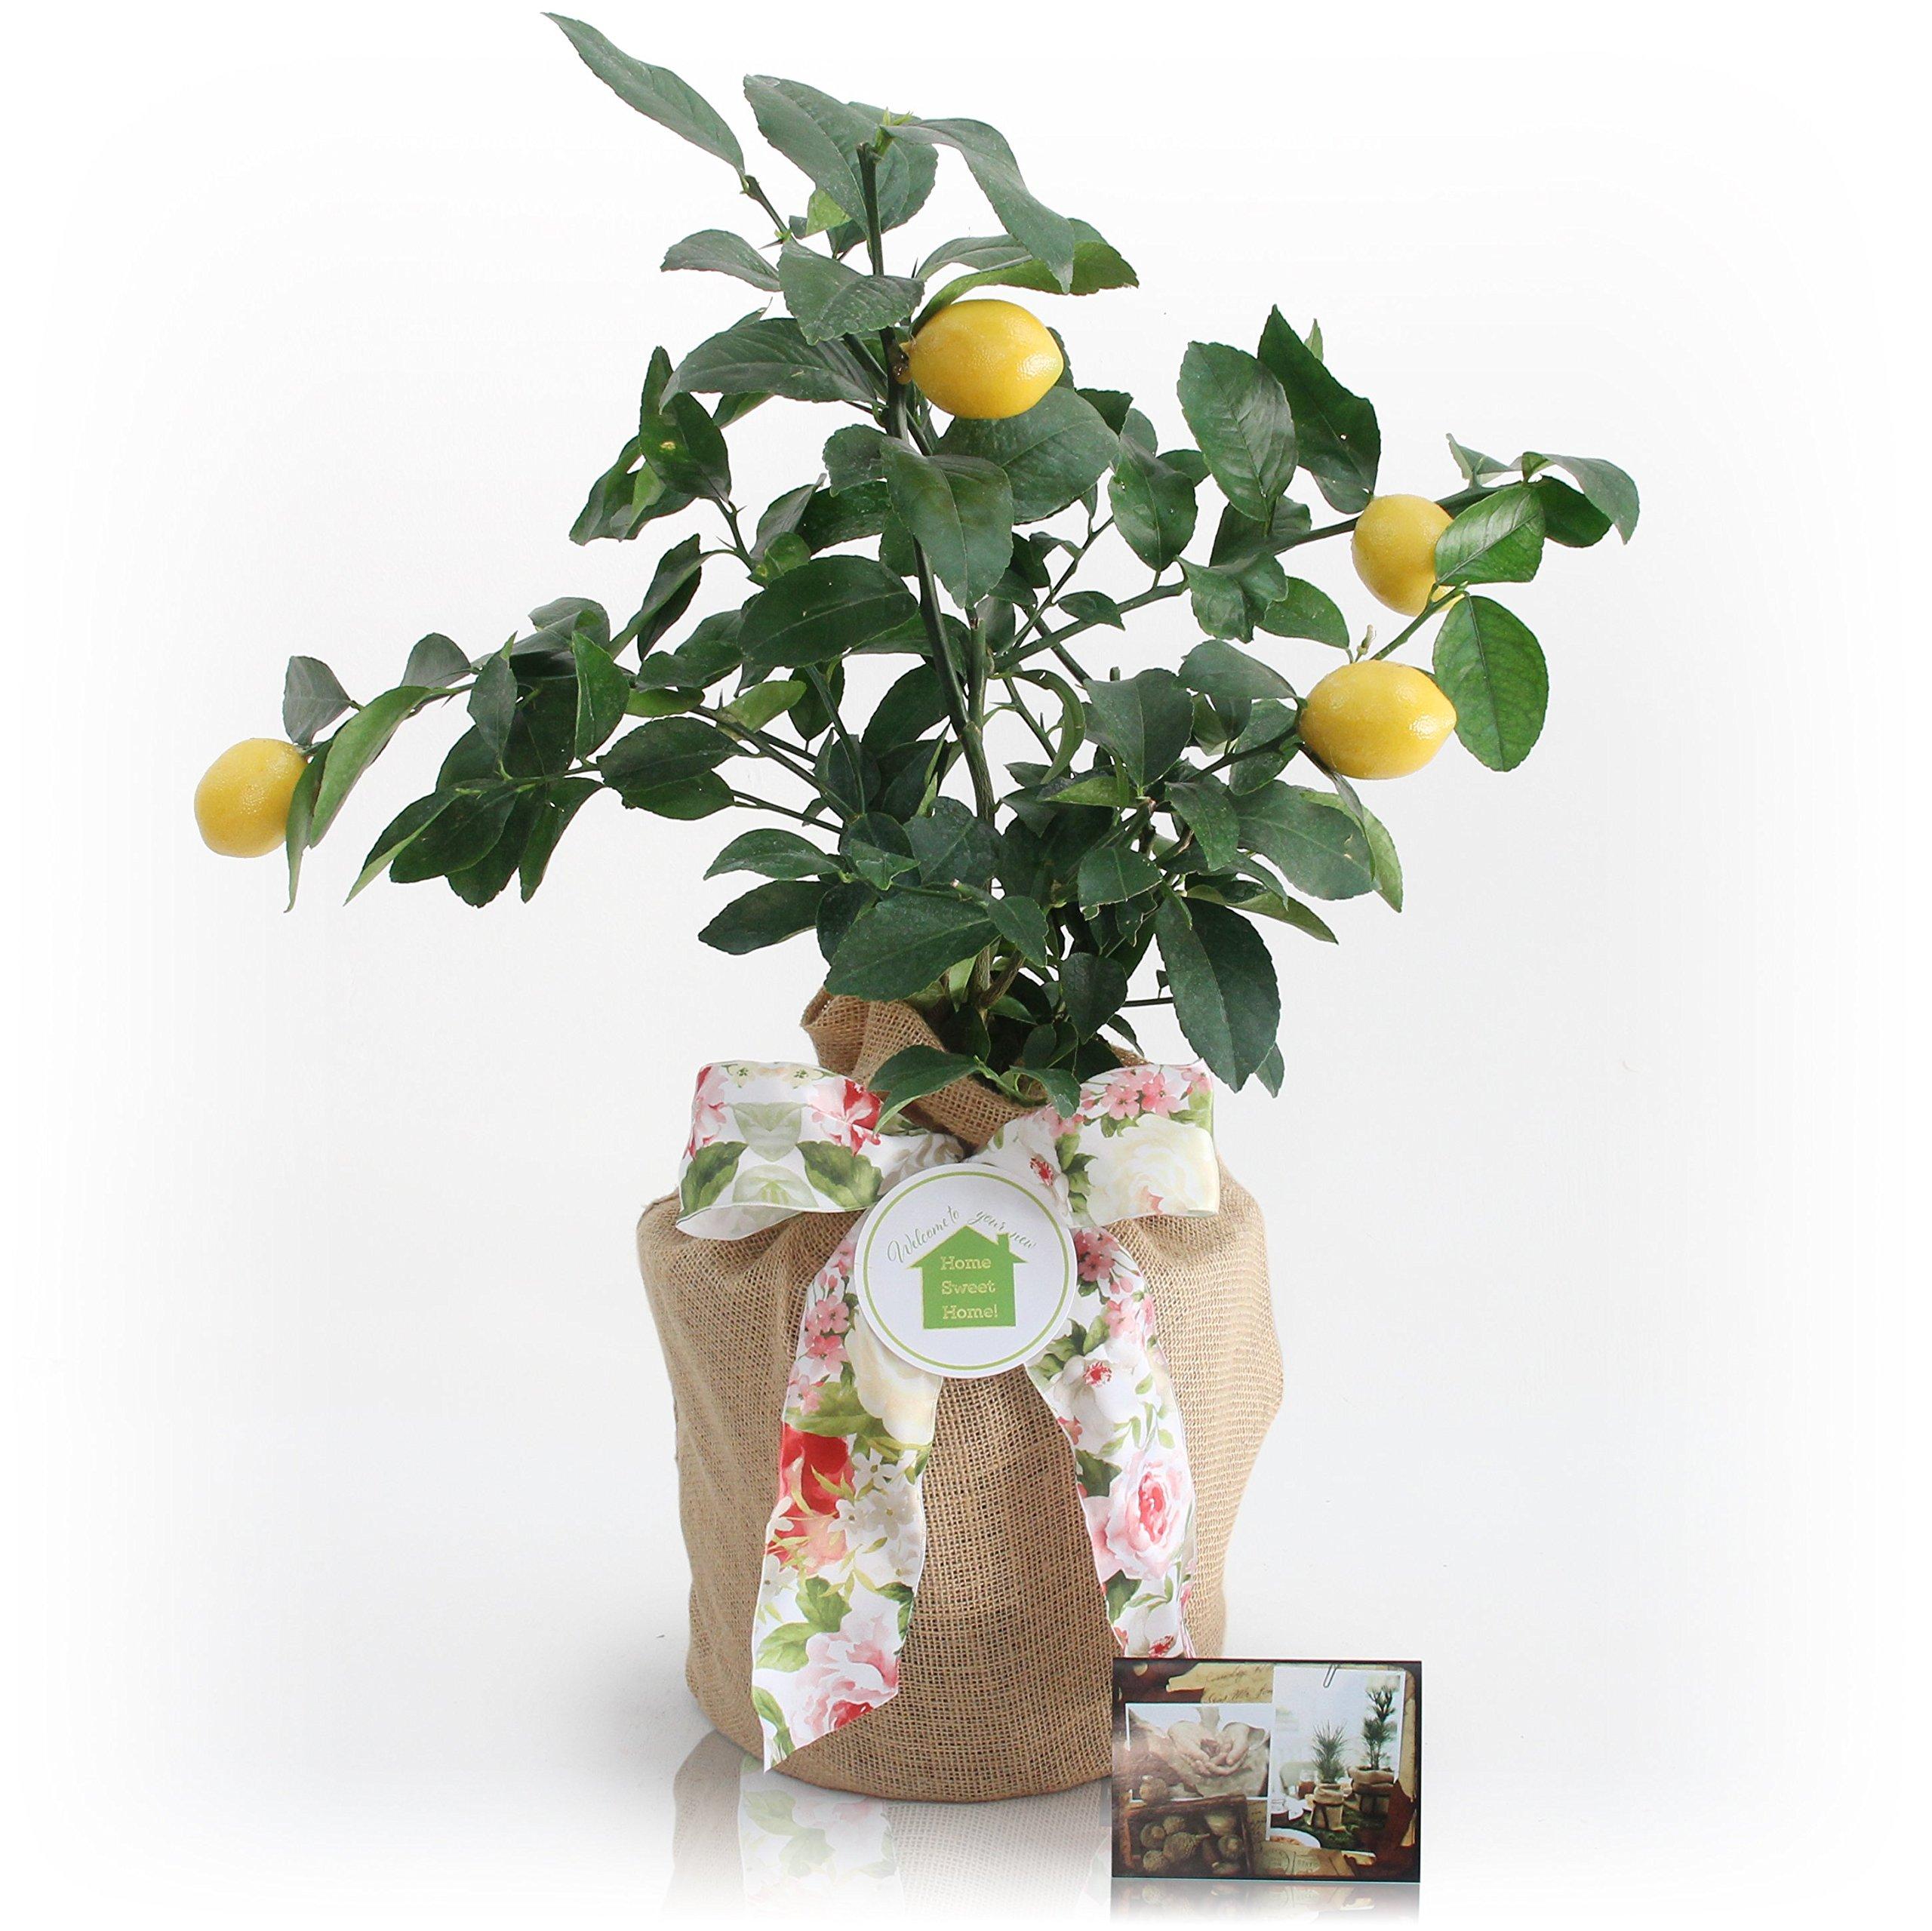 Housewarming Meyer Lemon Gift Tree by The Magnolia Company - Get Fruit 1st Year, Dwarf Fruit Tree with Juicy Sweet Lemons, NO Ship to TX, LA, AZ and CA by The Magnolia Company (Image #3)